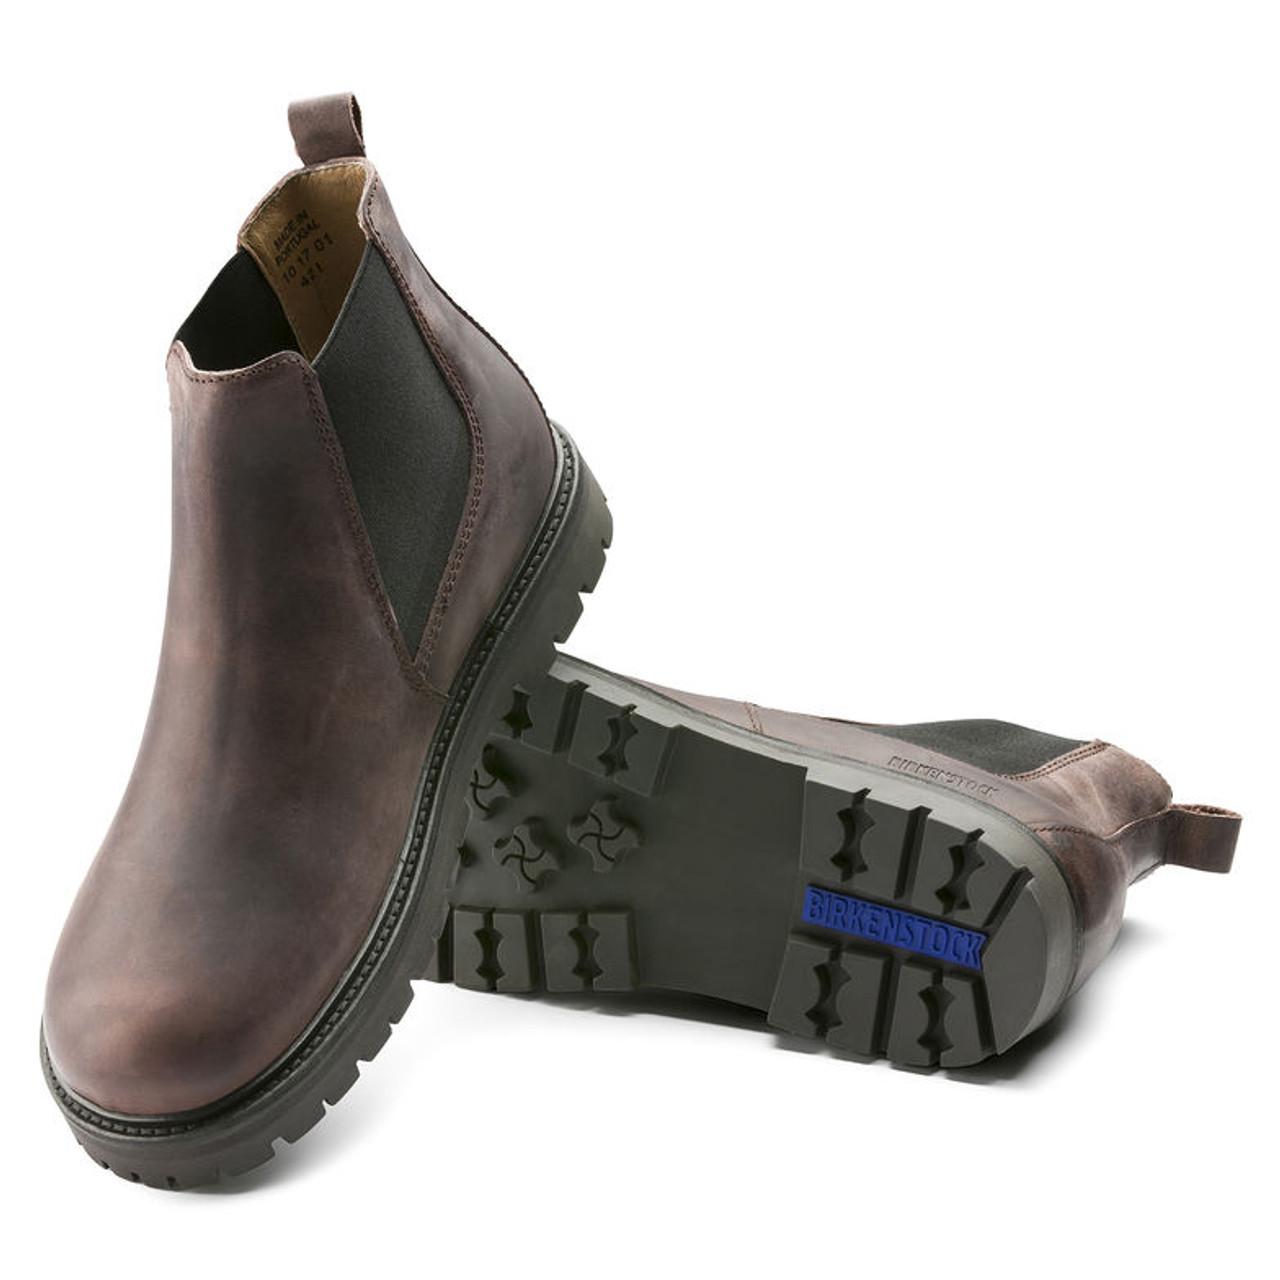 18cd37d10f2 Birkenstock Stalon Mocha Pull-On Boot - Herbert s Boots and Western Wear